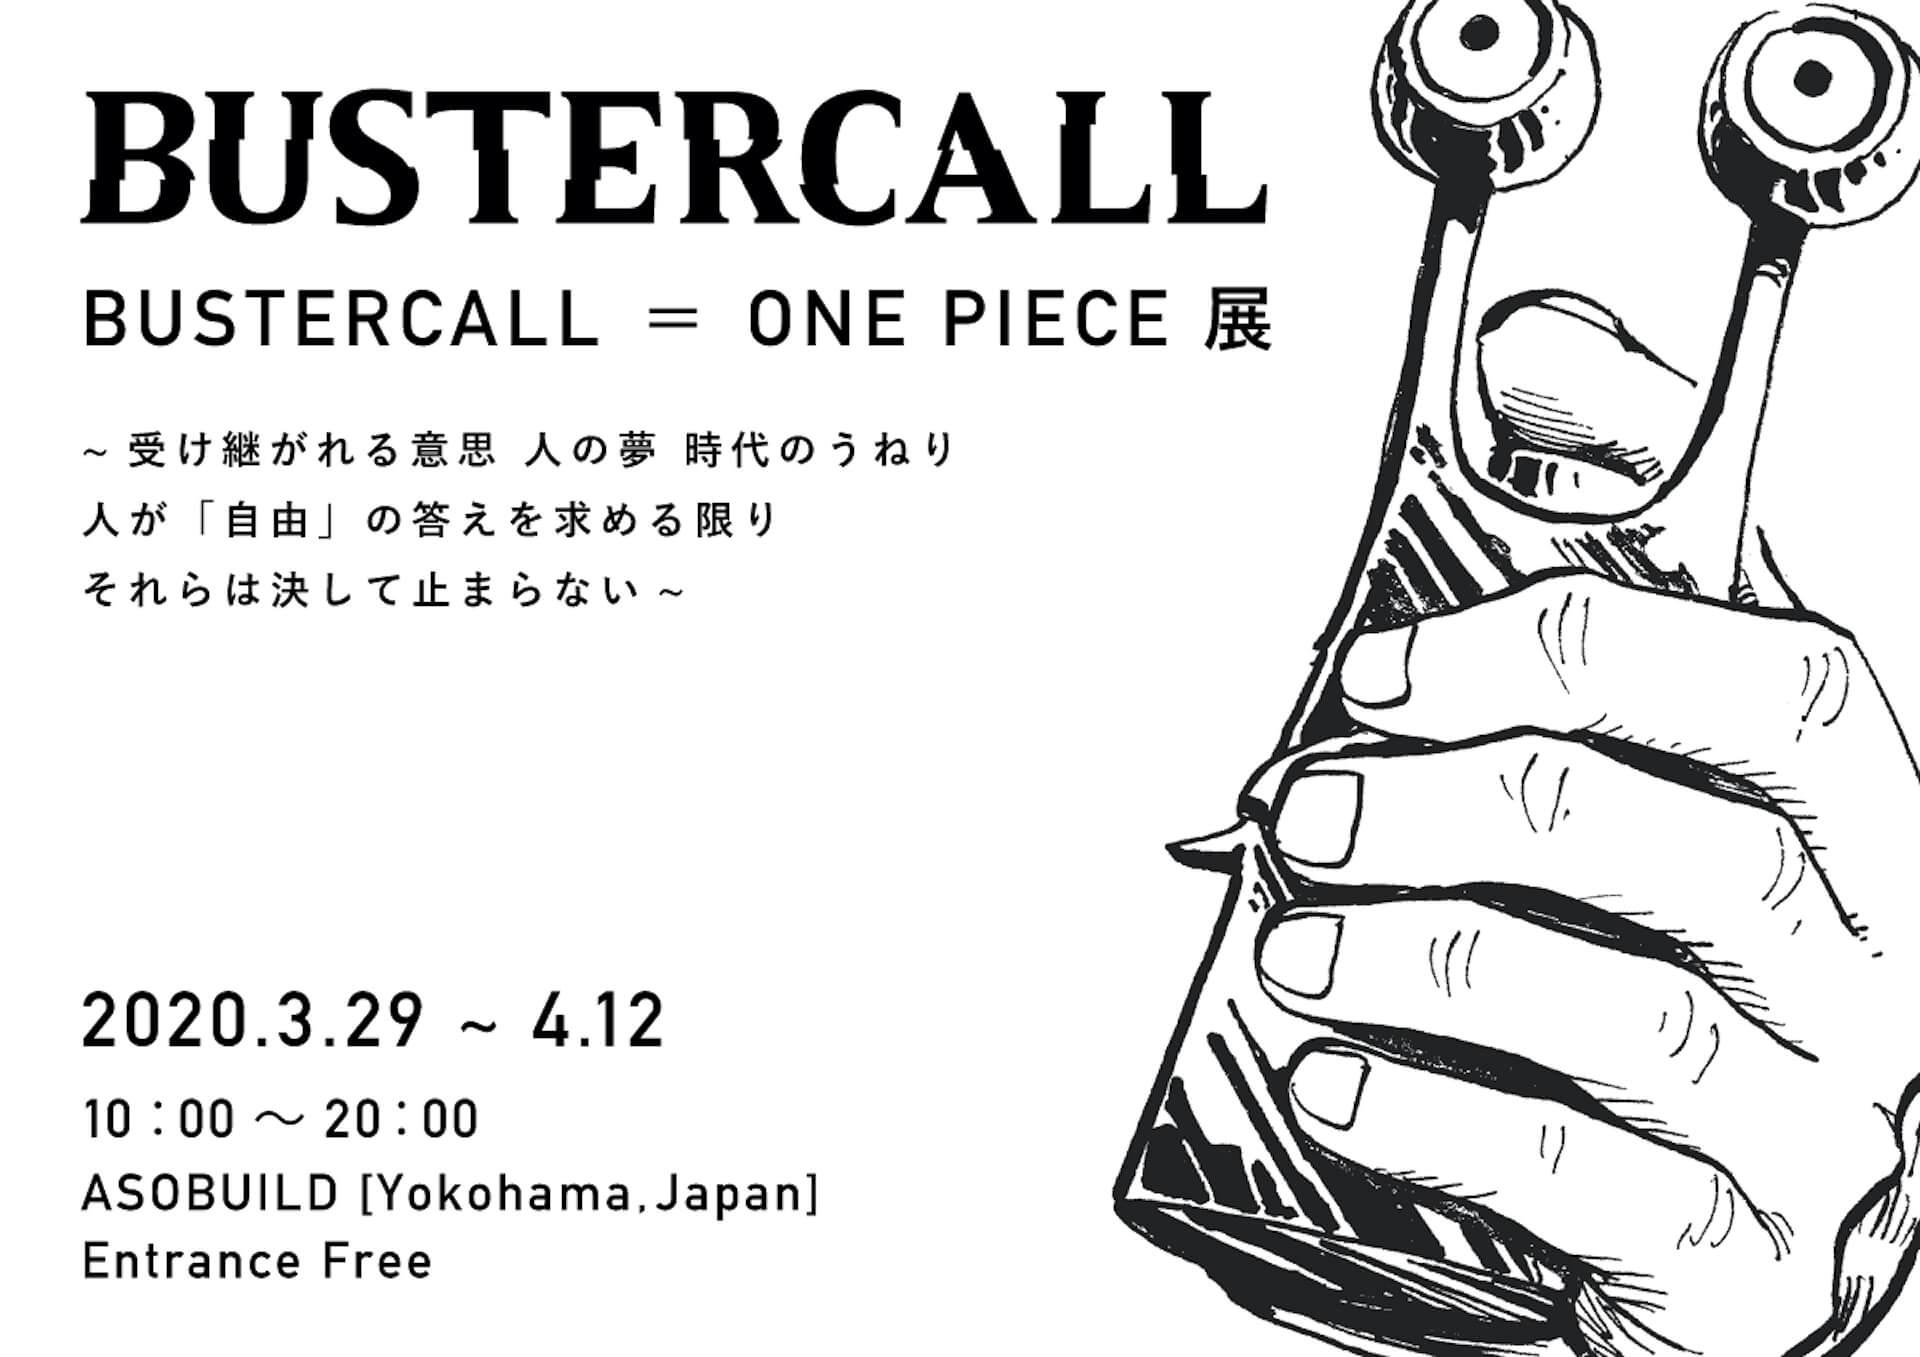 ONE PIECEのアートプロジェクトが日本初上陸。全世界から総勢200名のアーティストが参加する<BUSTERCALL=ONE PIECE展>が開催 art200205_-onepiecebustercall_1